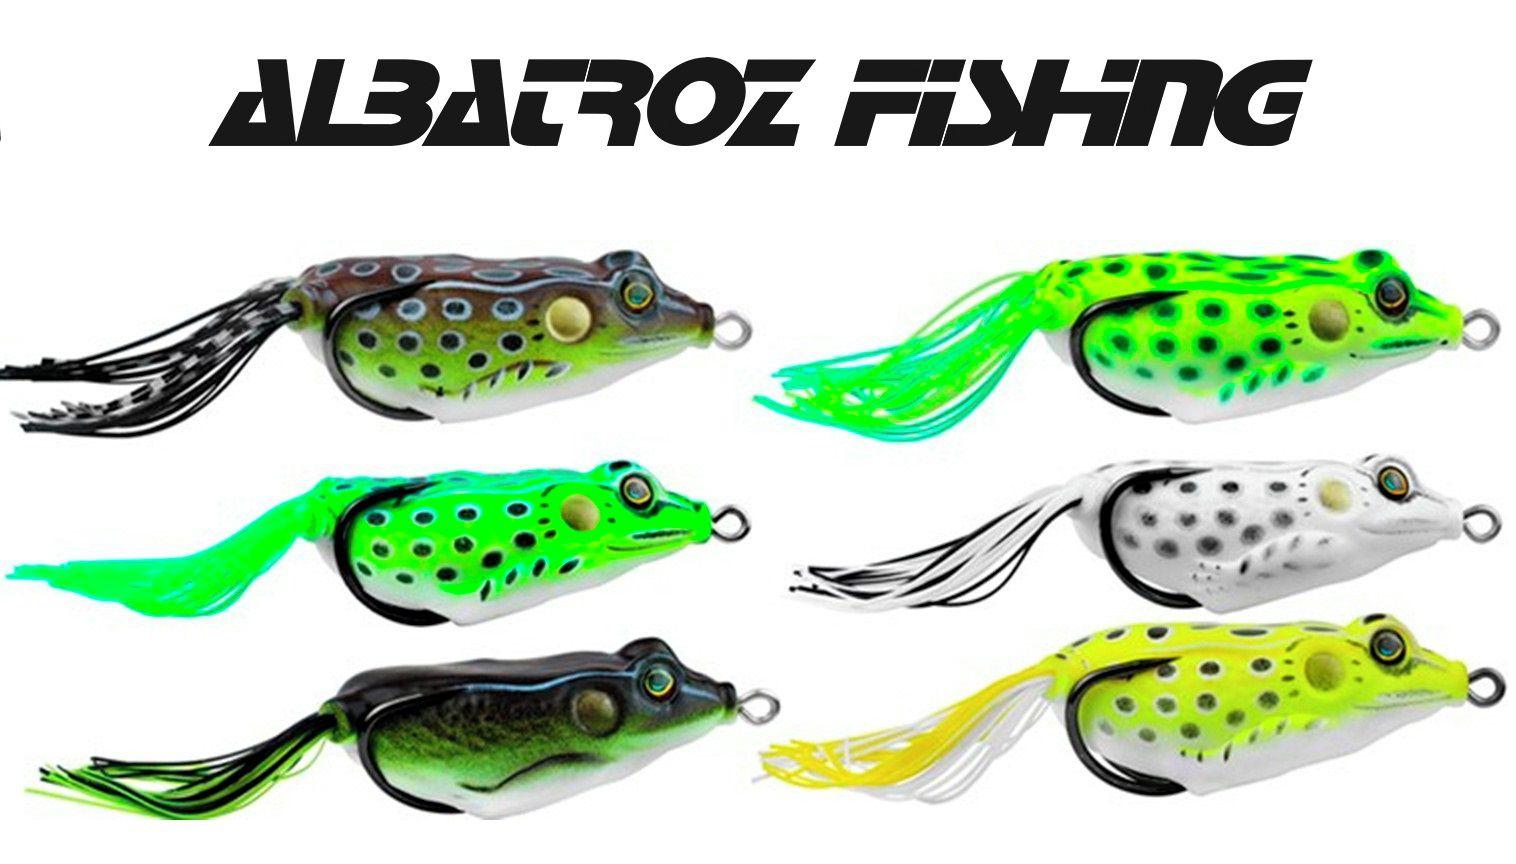 Isca Soft Top Frog XY-10 - Albatroz Fishing